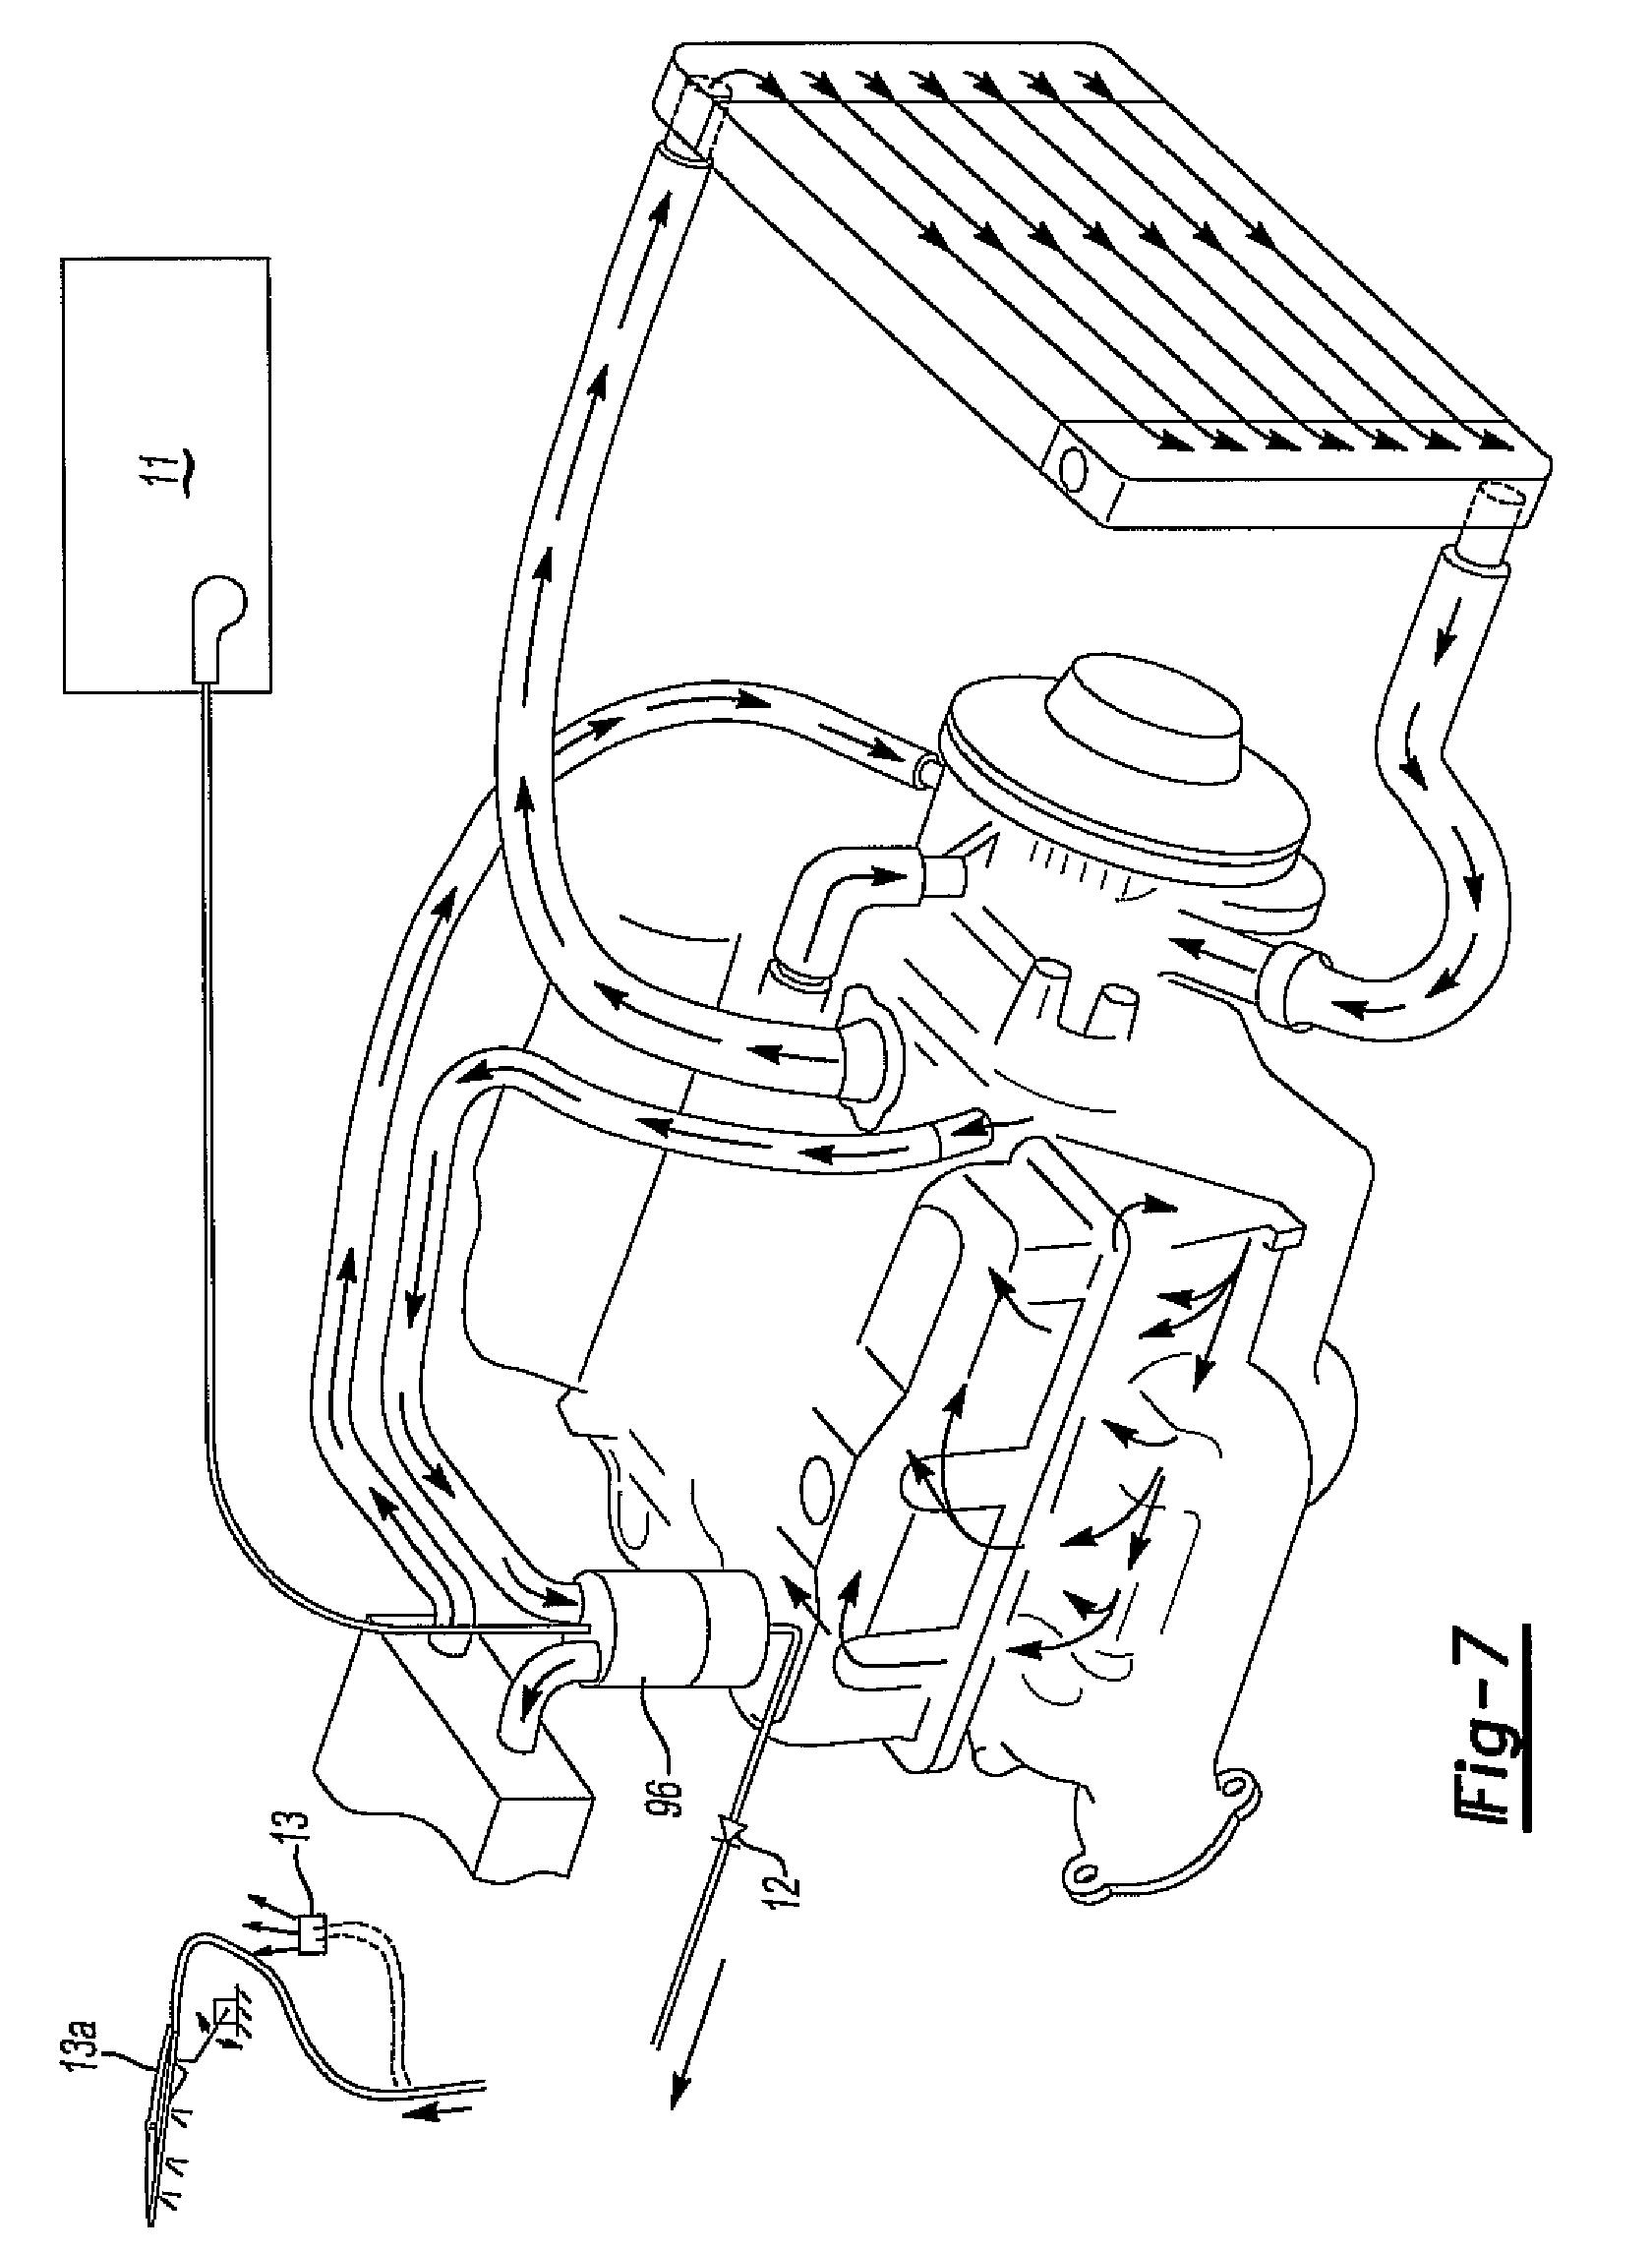 wiring diagram for 1957 ford ranchero wagon